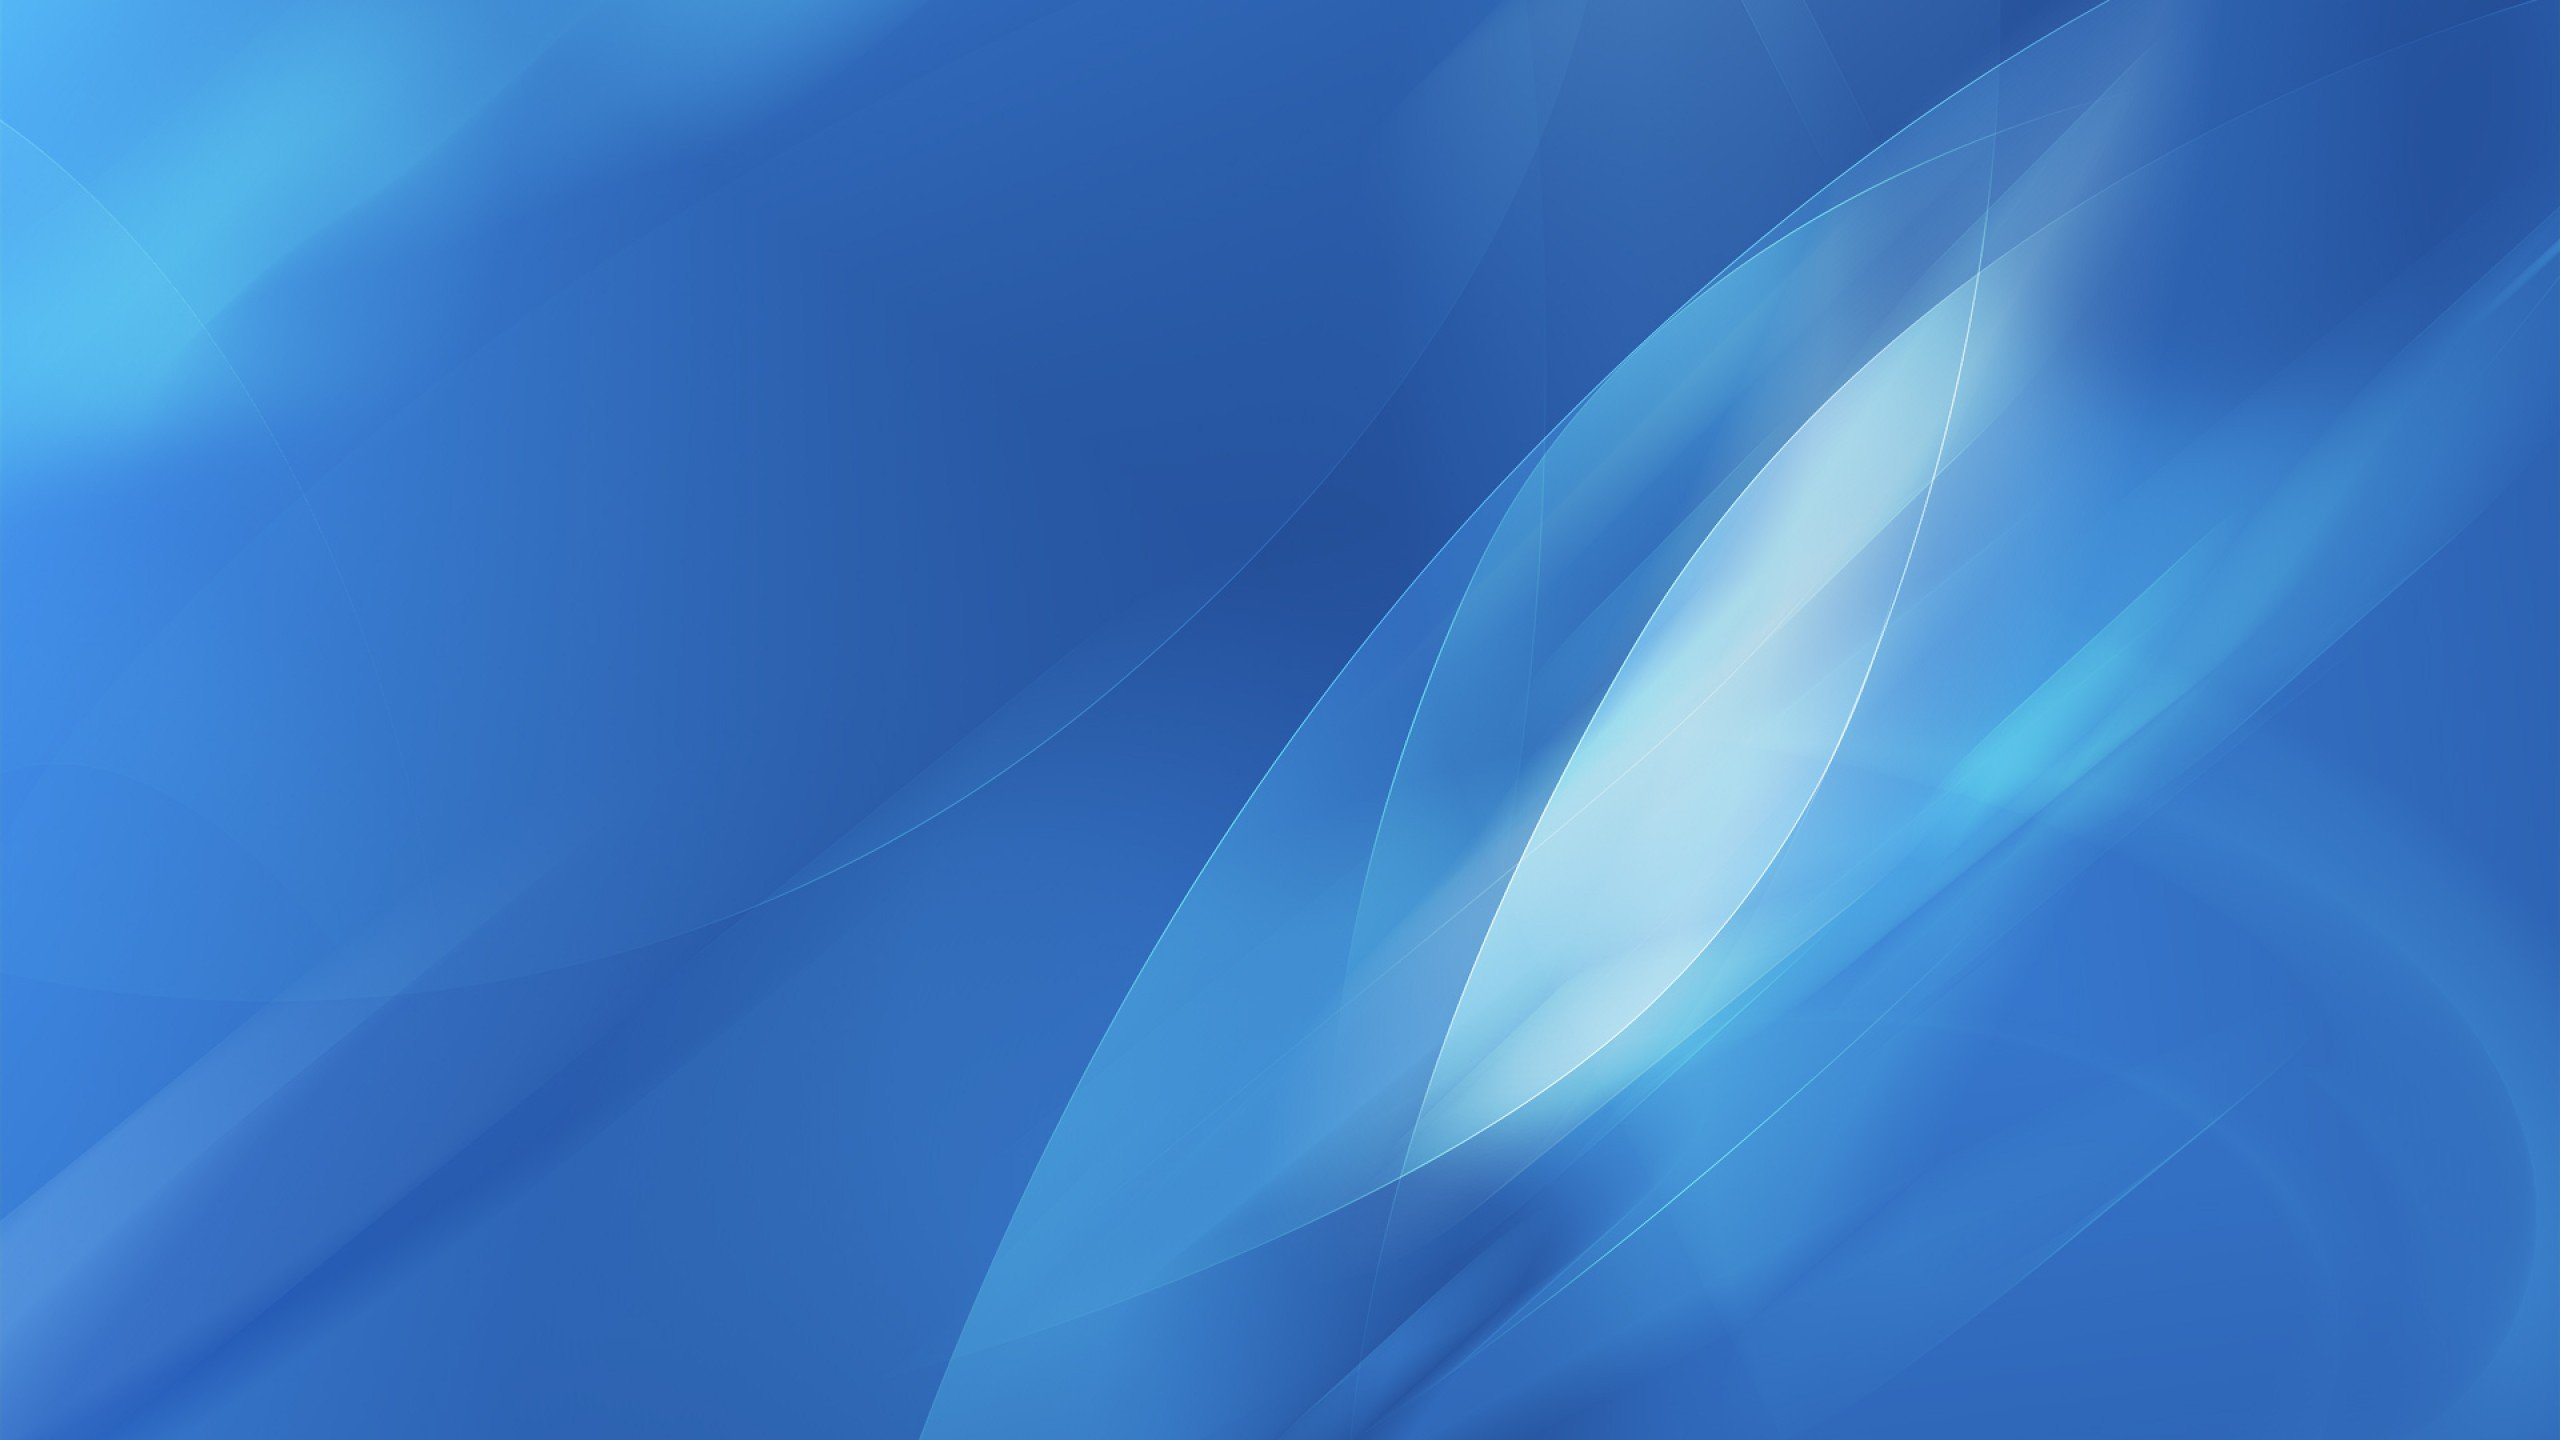 картинки фон для презентации голубой фон полизал